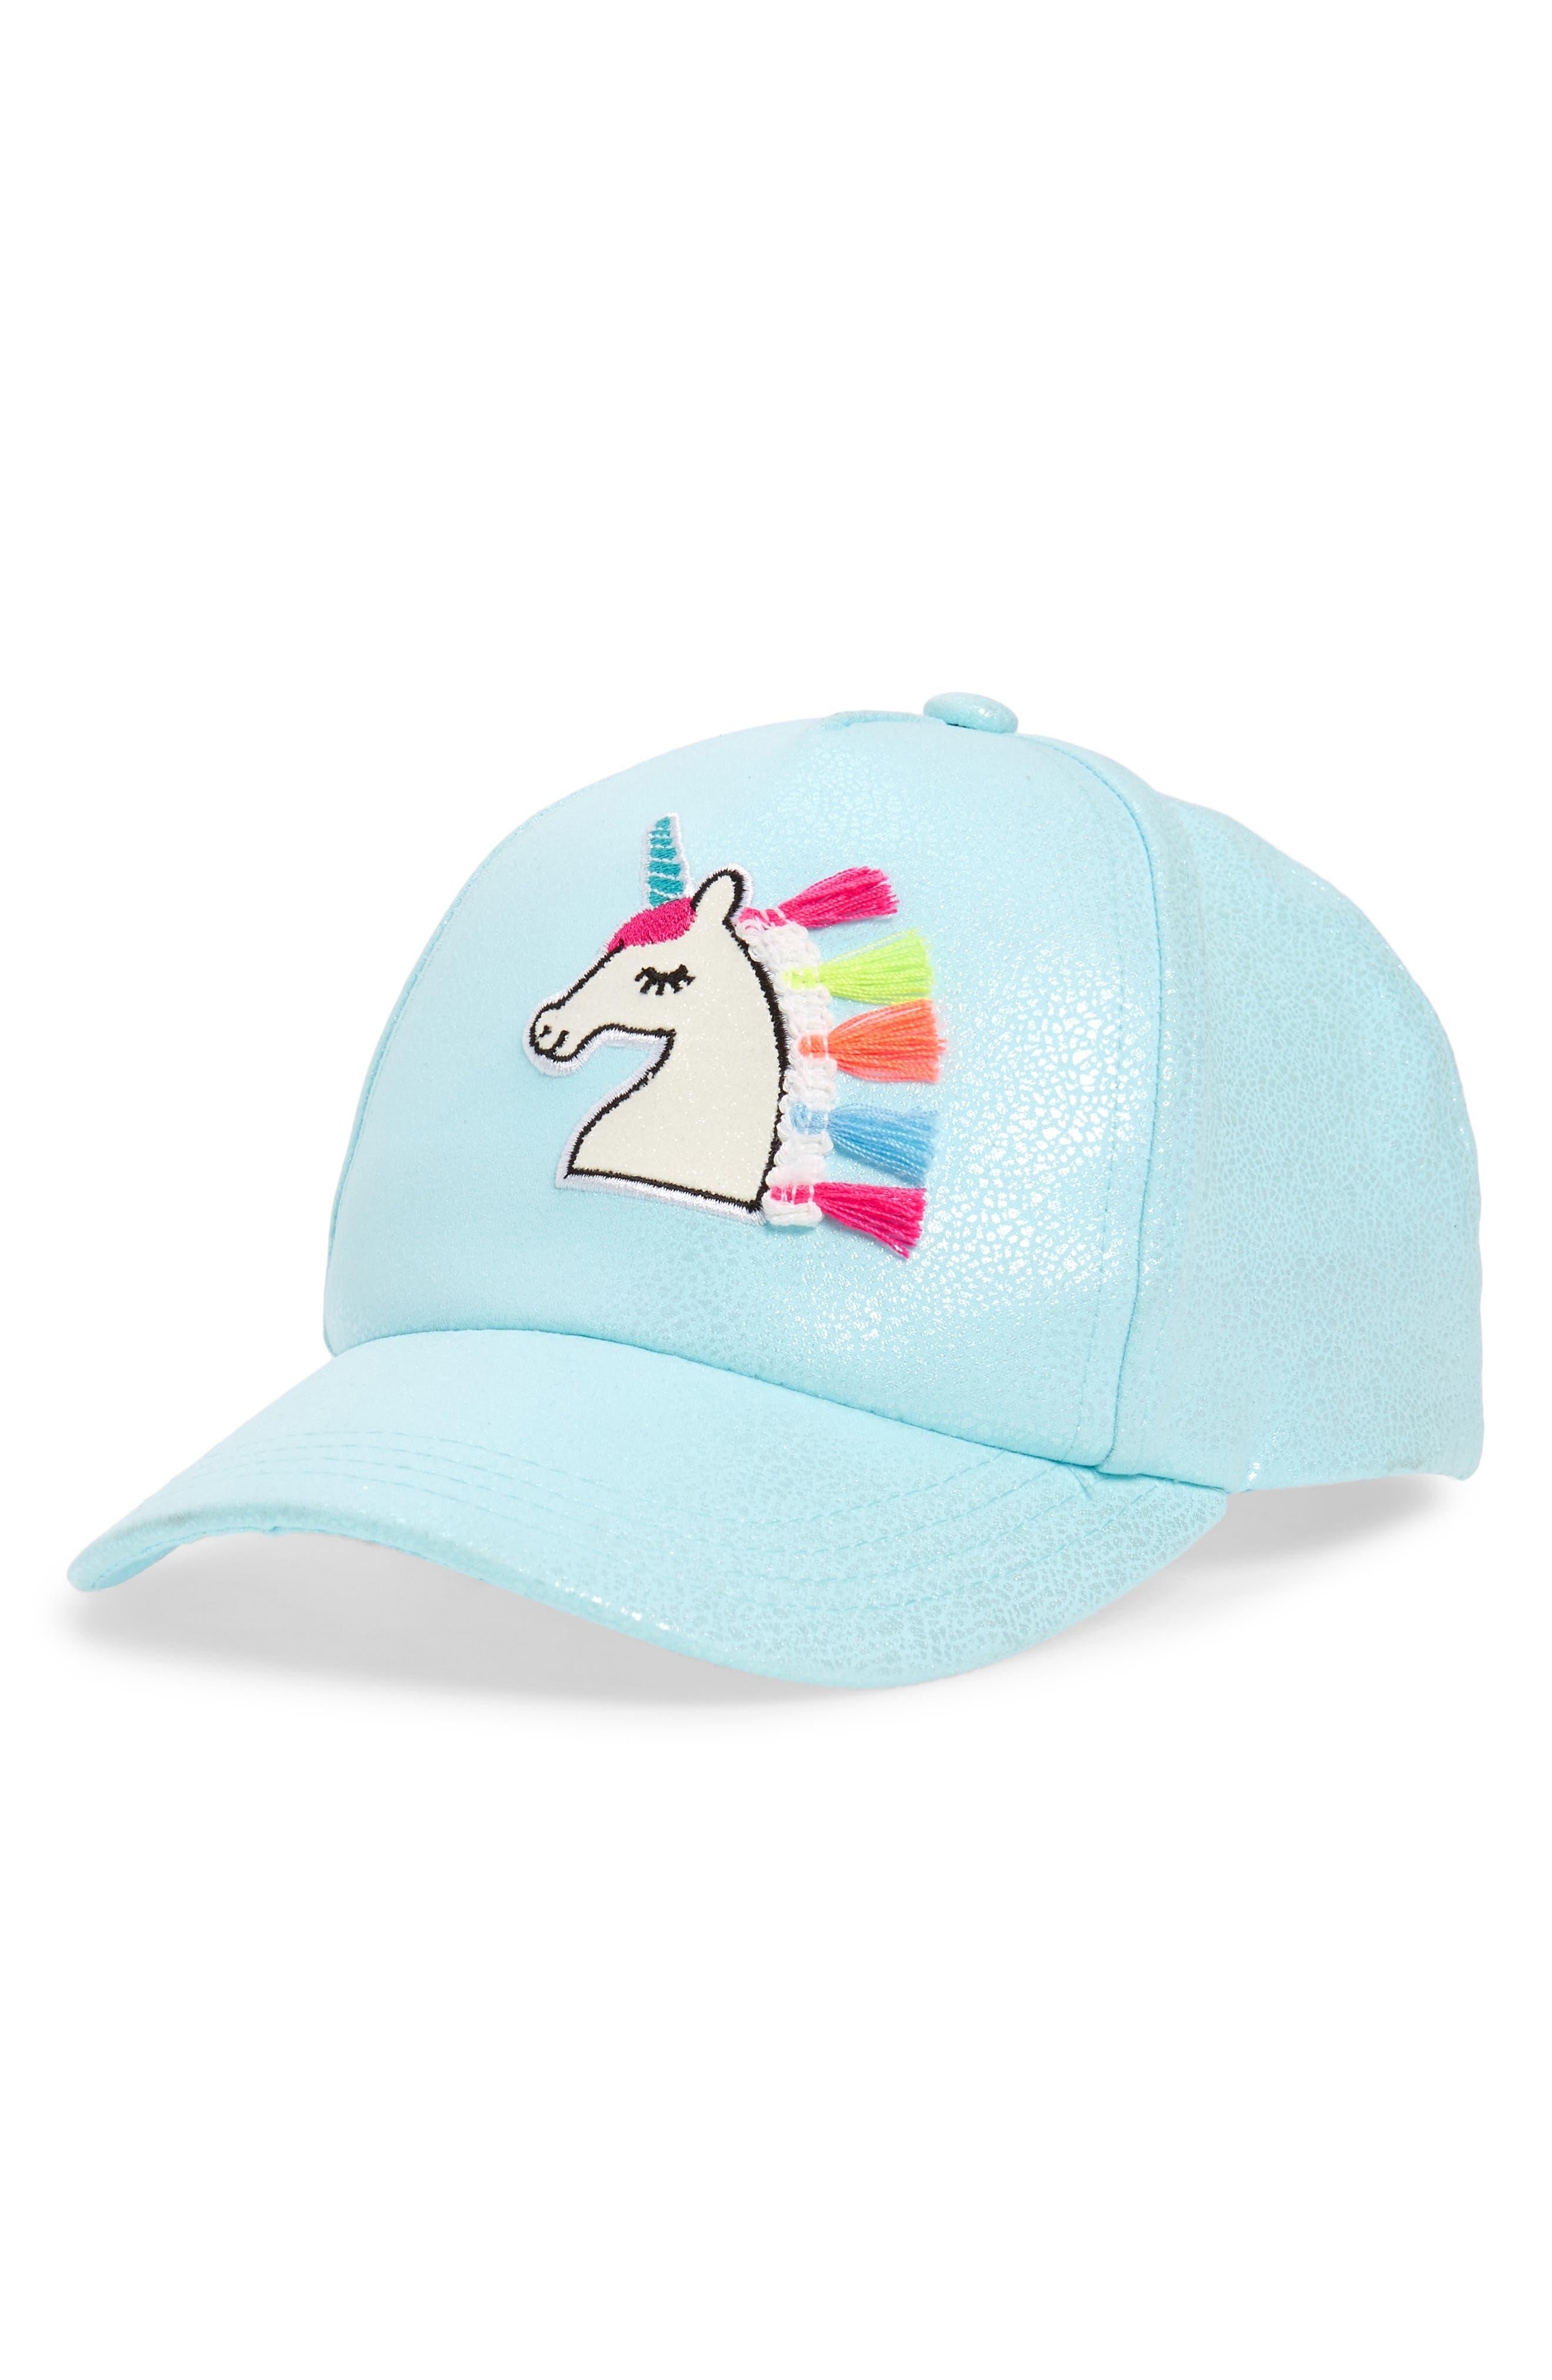 Girls Capelli New York Magical Unicorn Baseball Hat  Blue